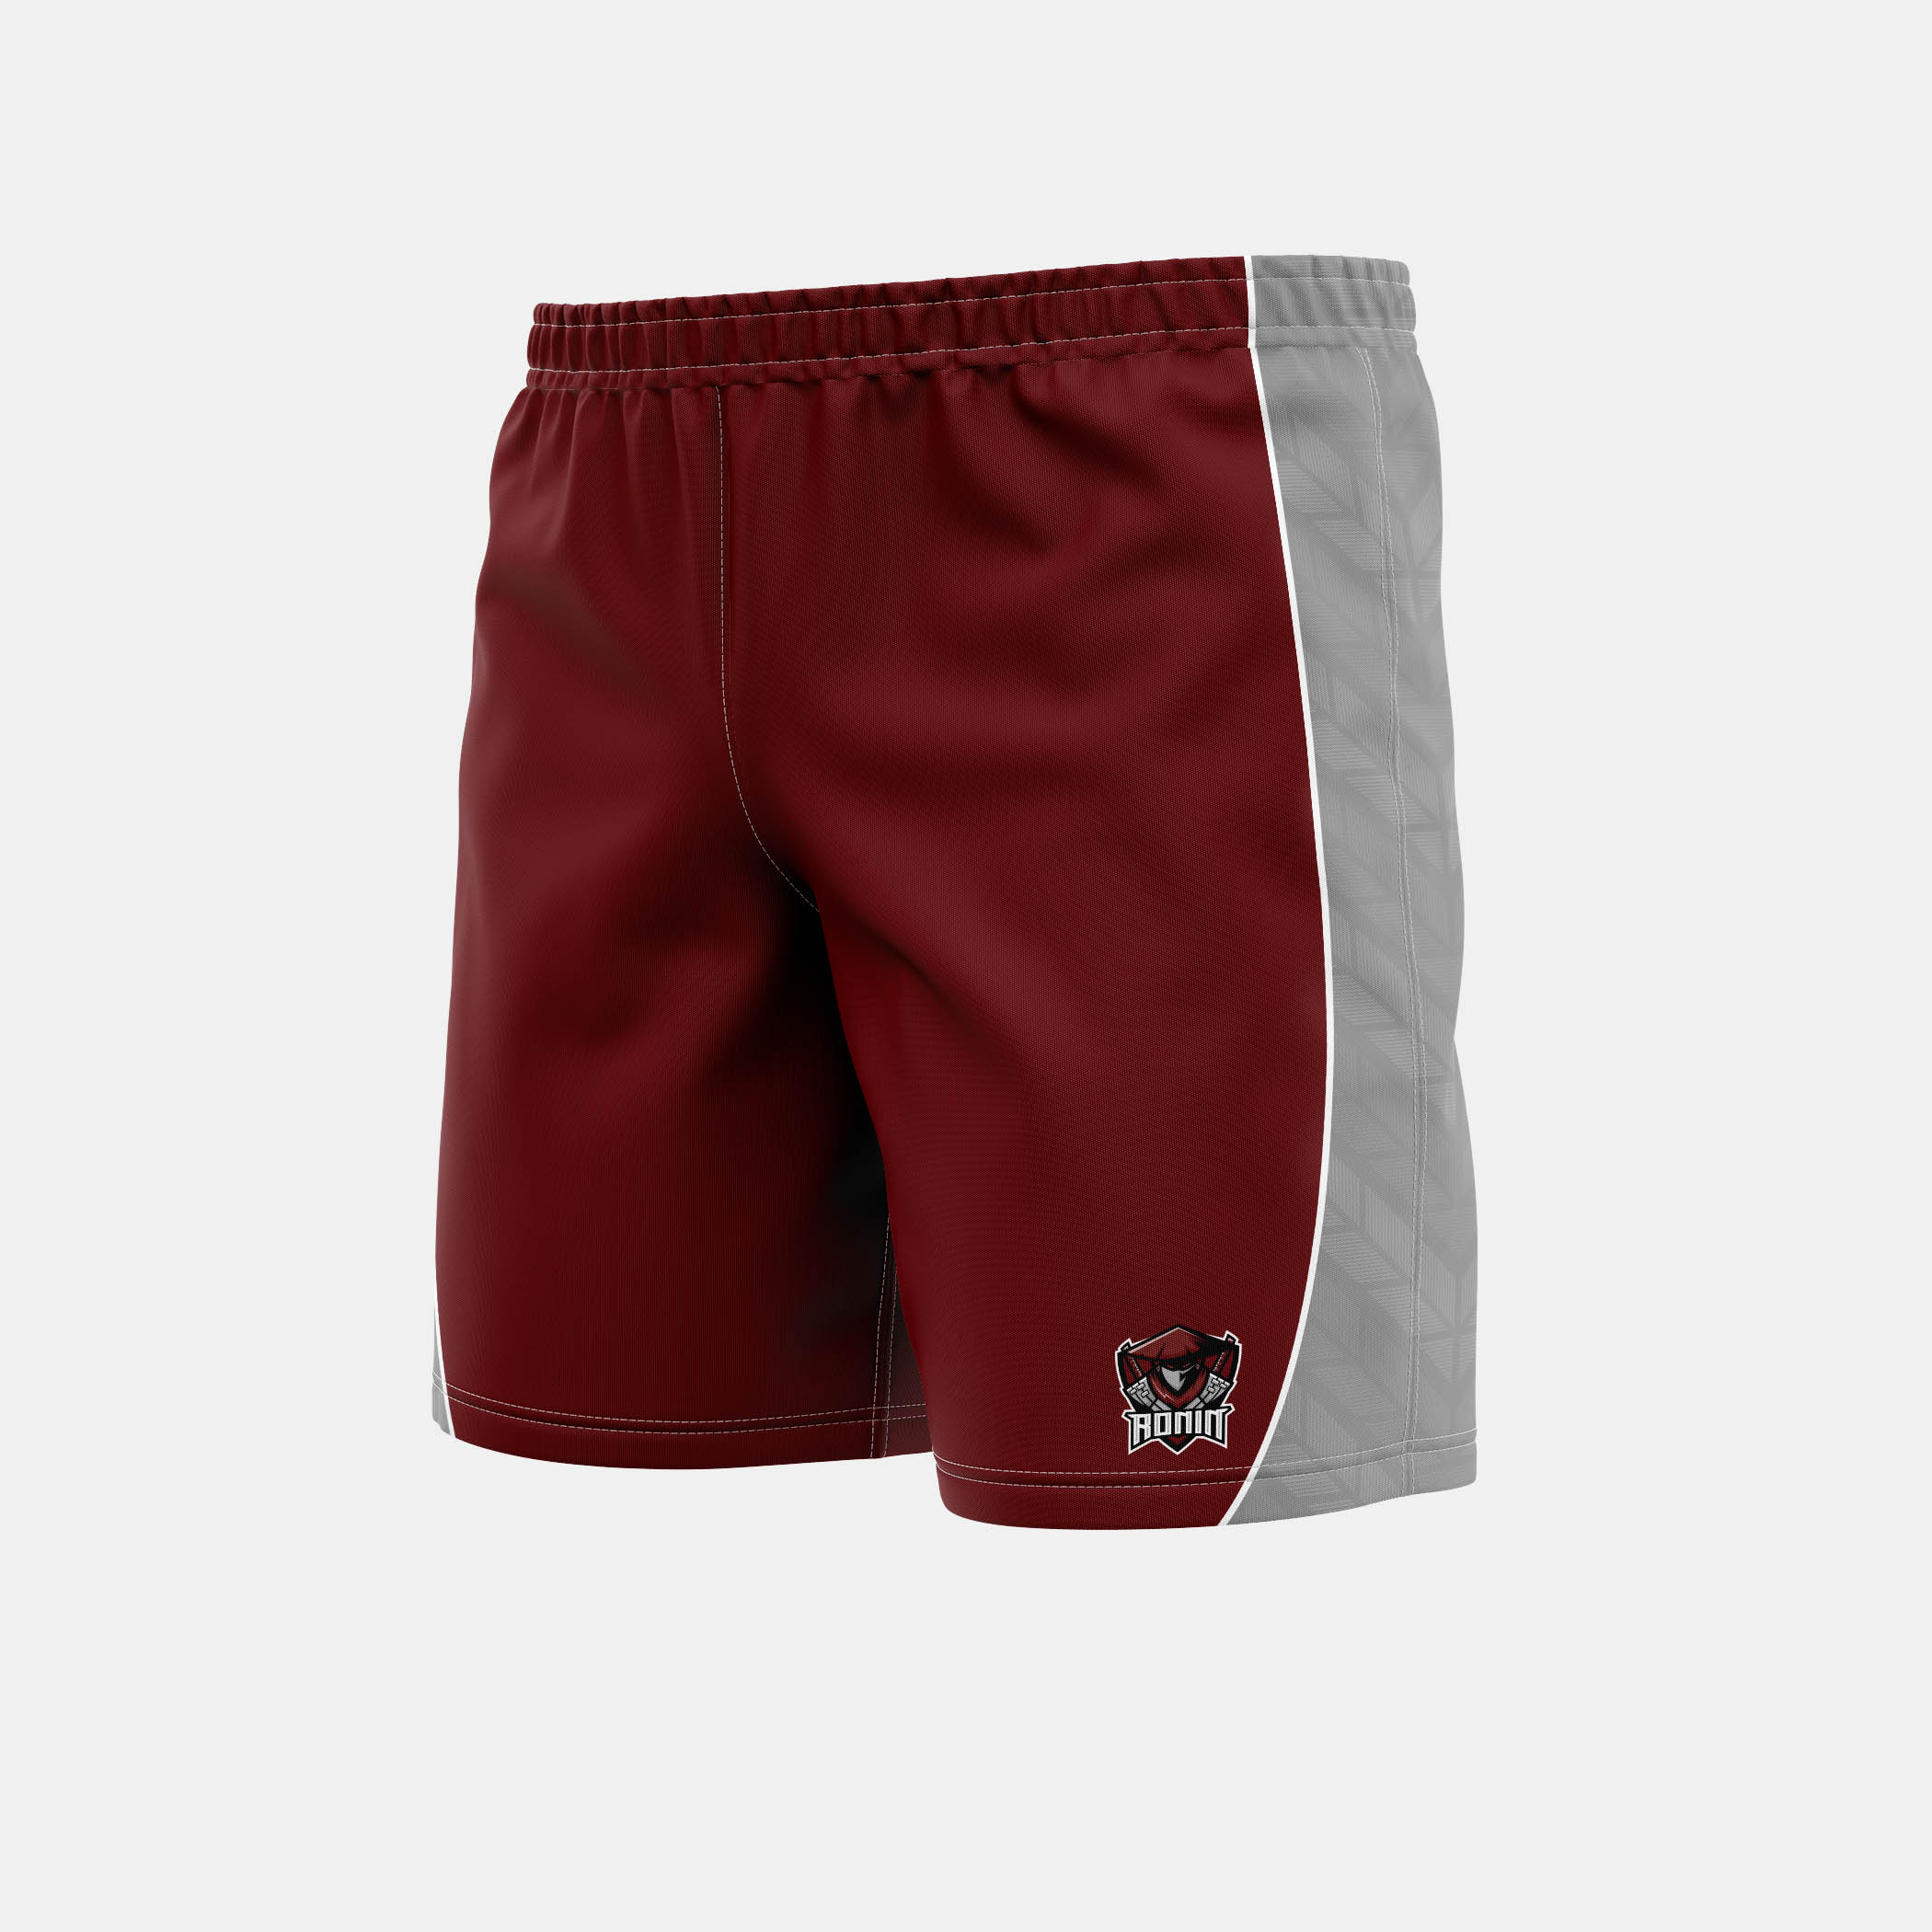 Ronin VB Shorts 3 4 L View edited